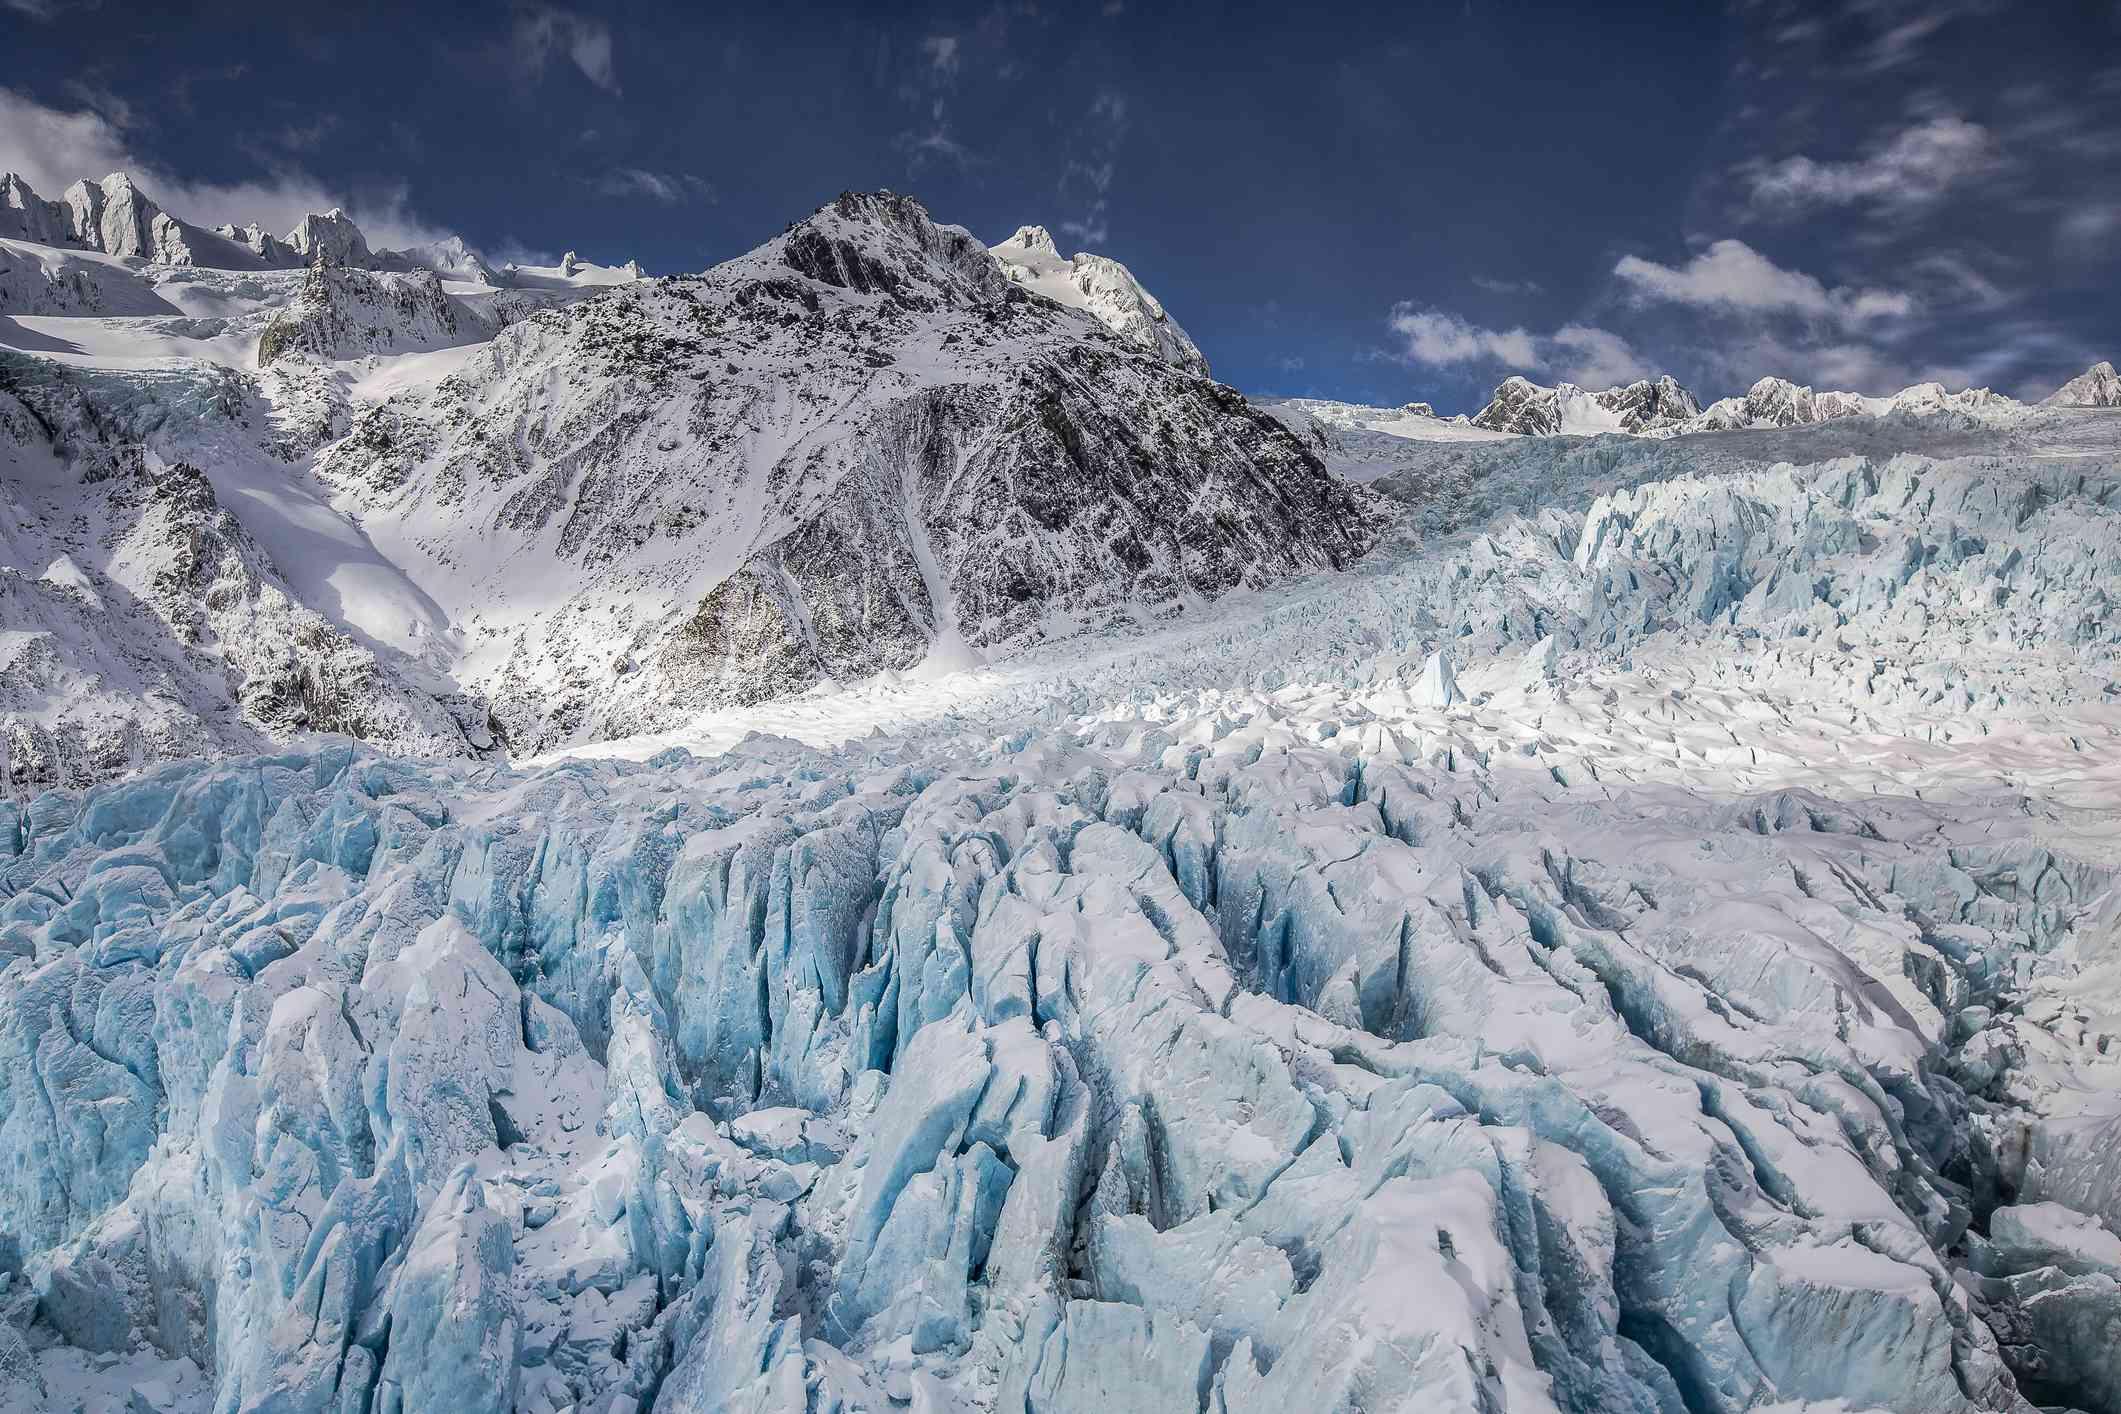 Aerial view of a Franz Josef glacier